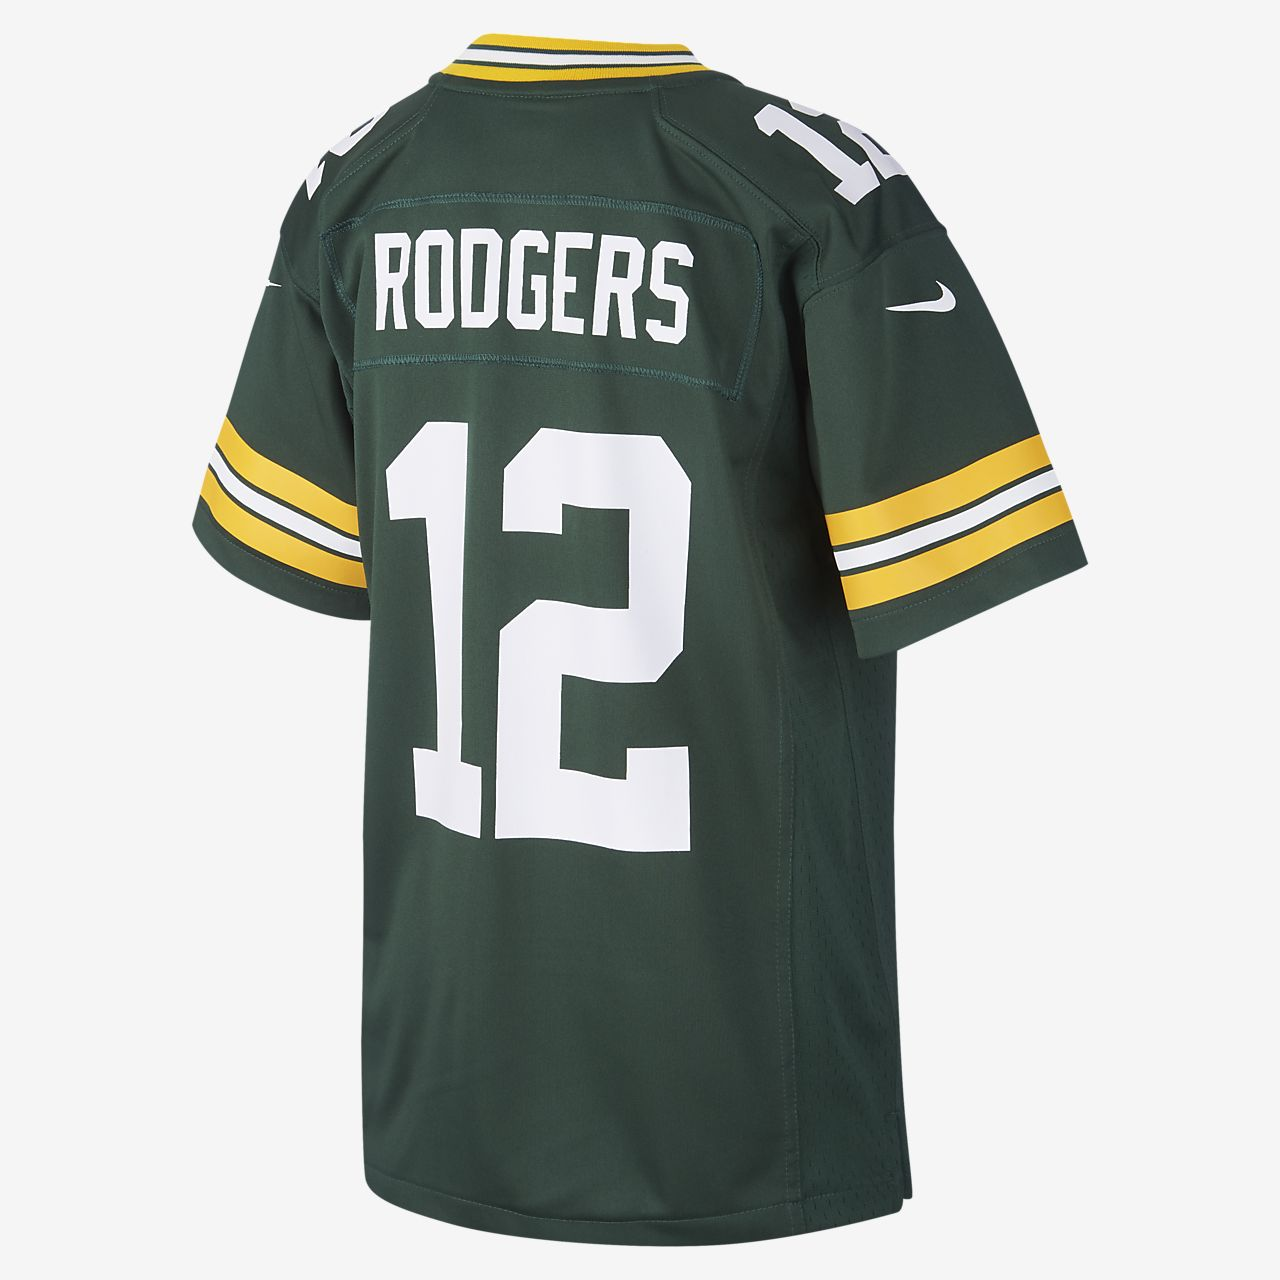 Maglia da football americano NFL Green Bay Packers (Aaron Rodgers) Home Game Uomo